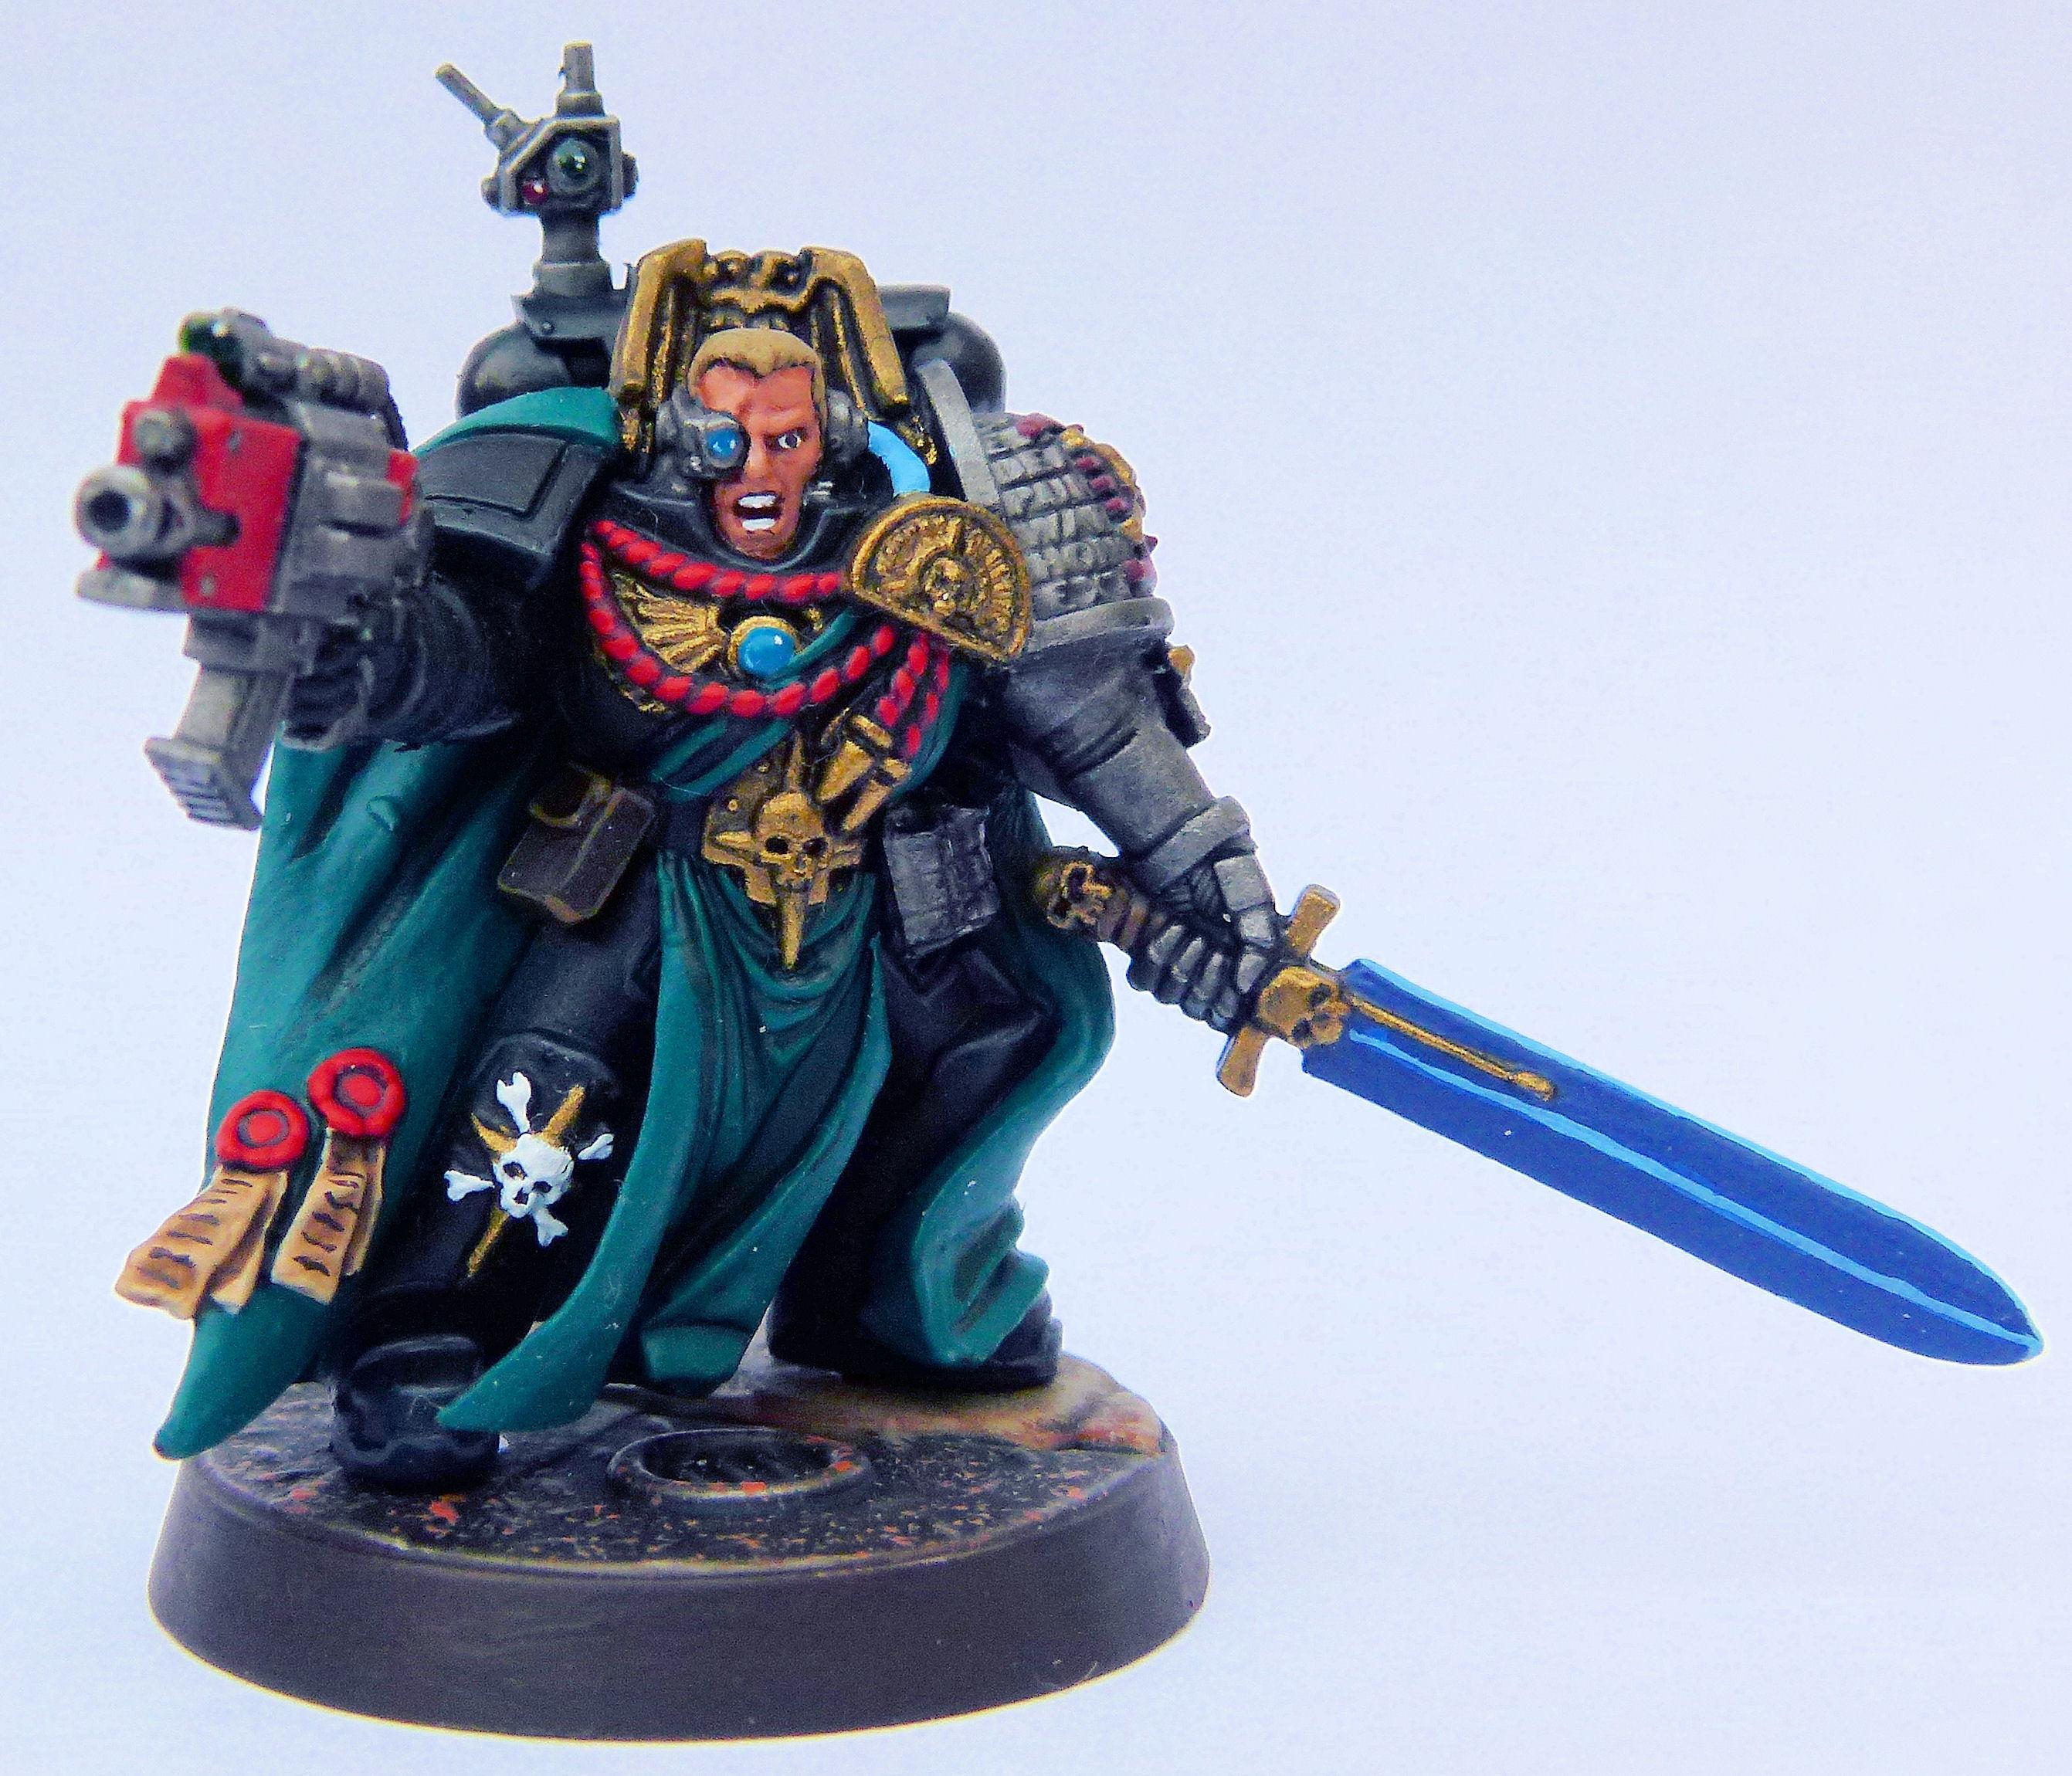 Captain, Deathwatch, Blackshield Deathwatch Veteran Front